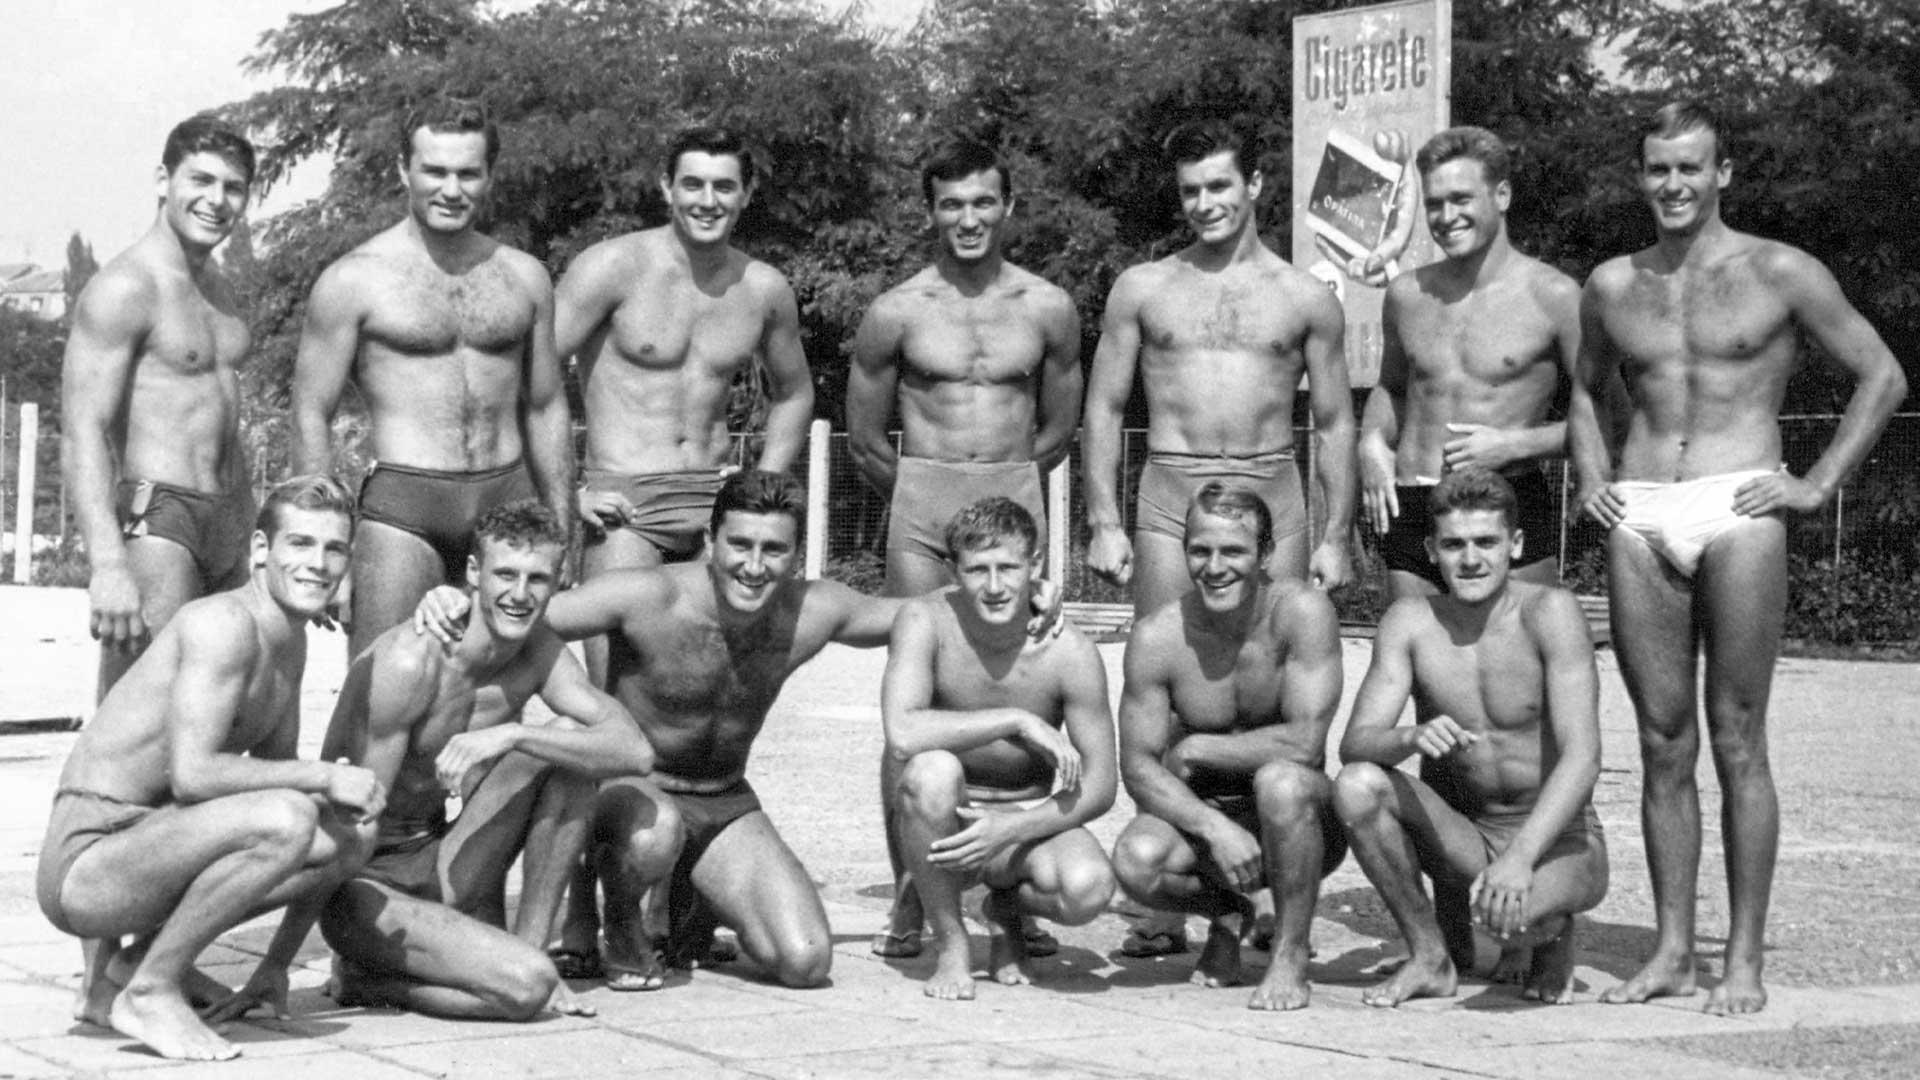 jadran-herceg-novi-druga-titula-1959